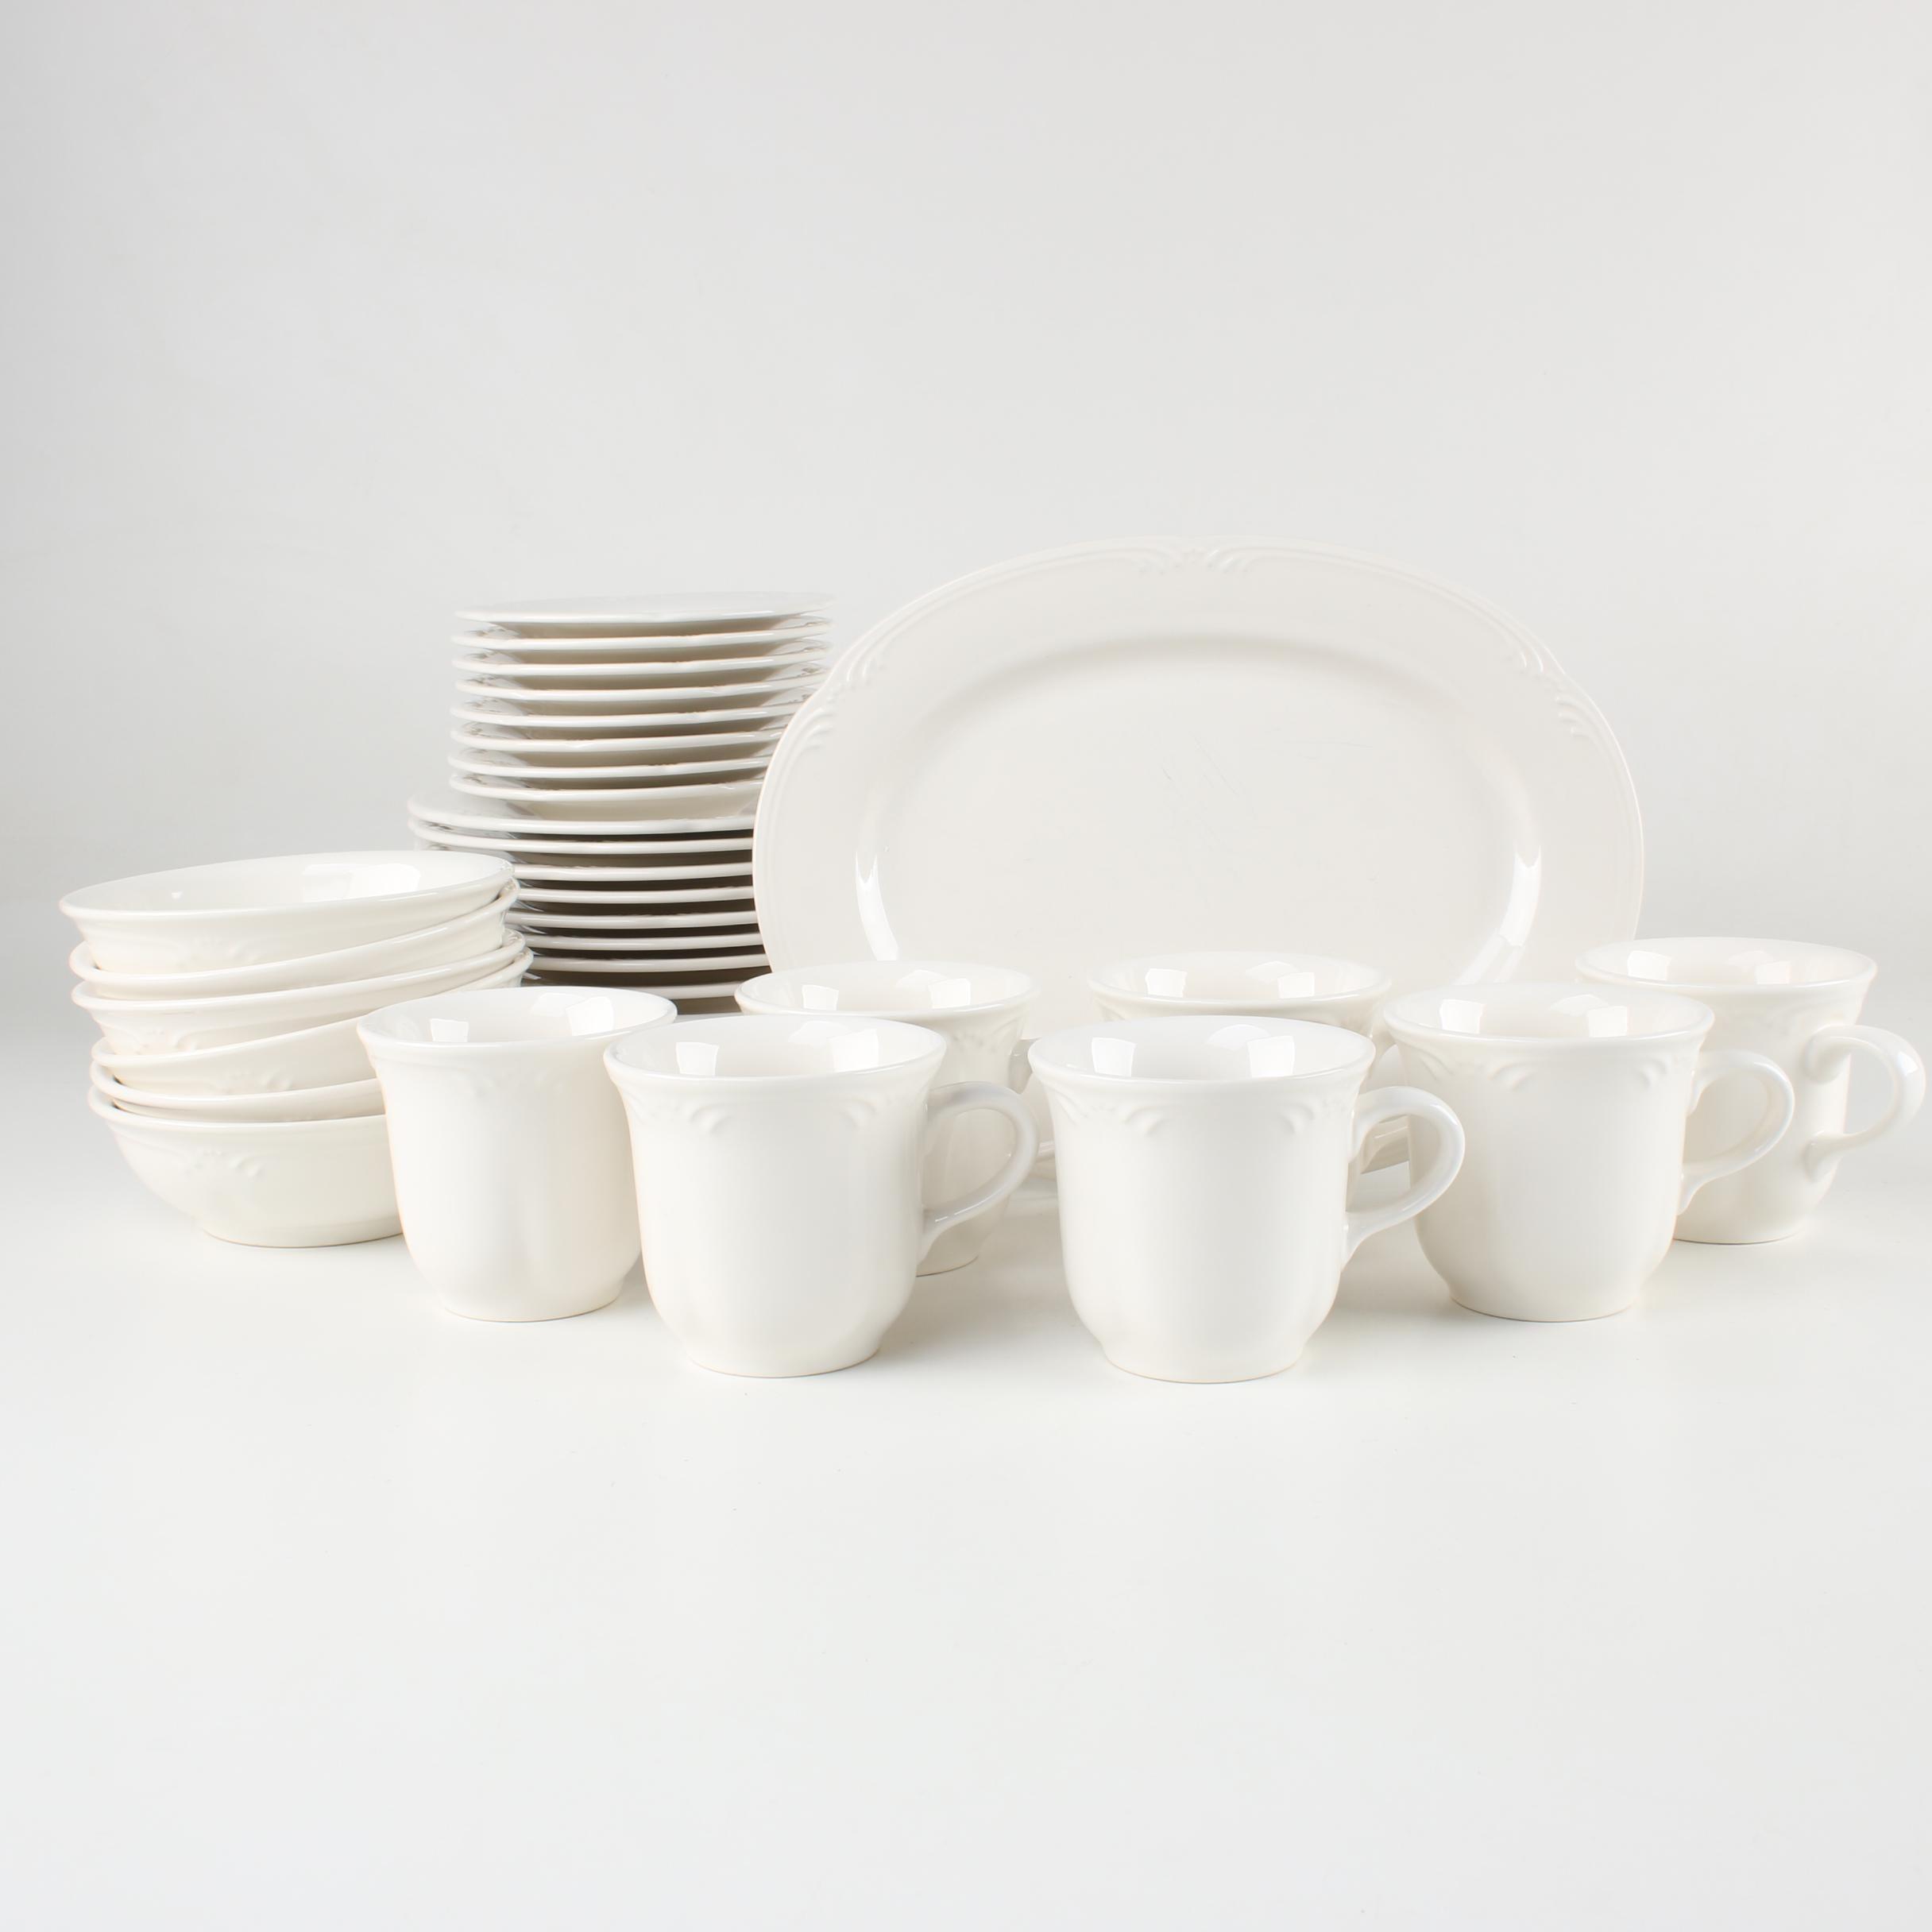 Pfaltzgraff White Stoneware Serving Platter and Dinnerware